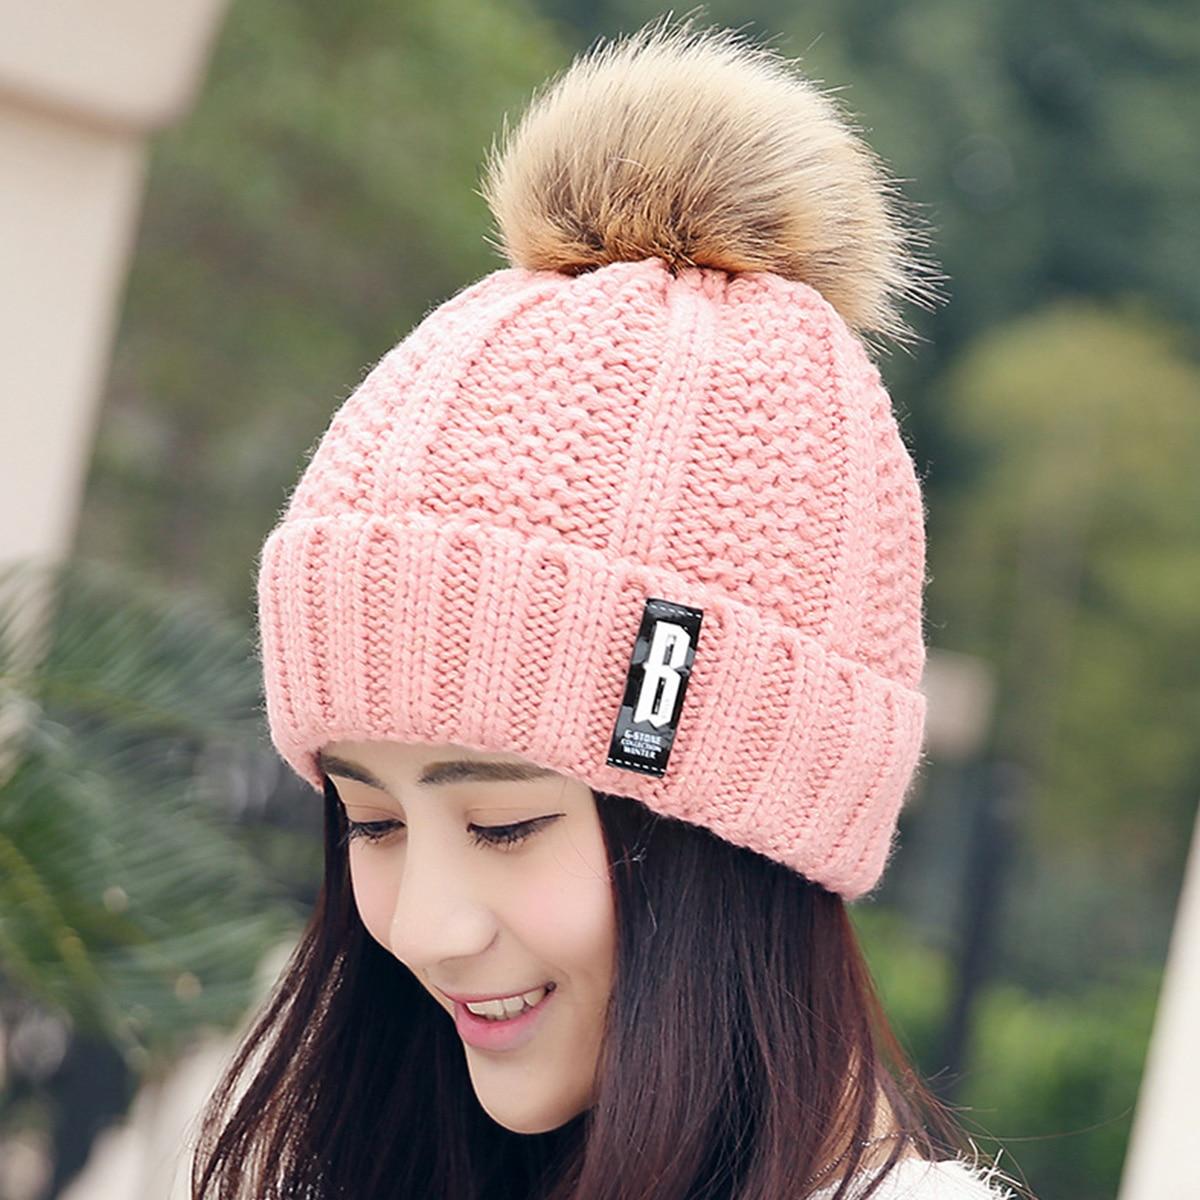 SIMPLESHOW 2018 High Quality Winter Hat Ladies Knit Hat Women s Beanies  Skullies Beanies Fashion Winter Pom 7ec498a03